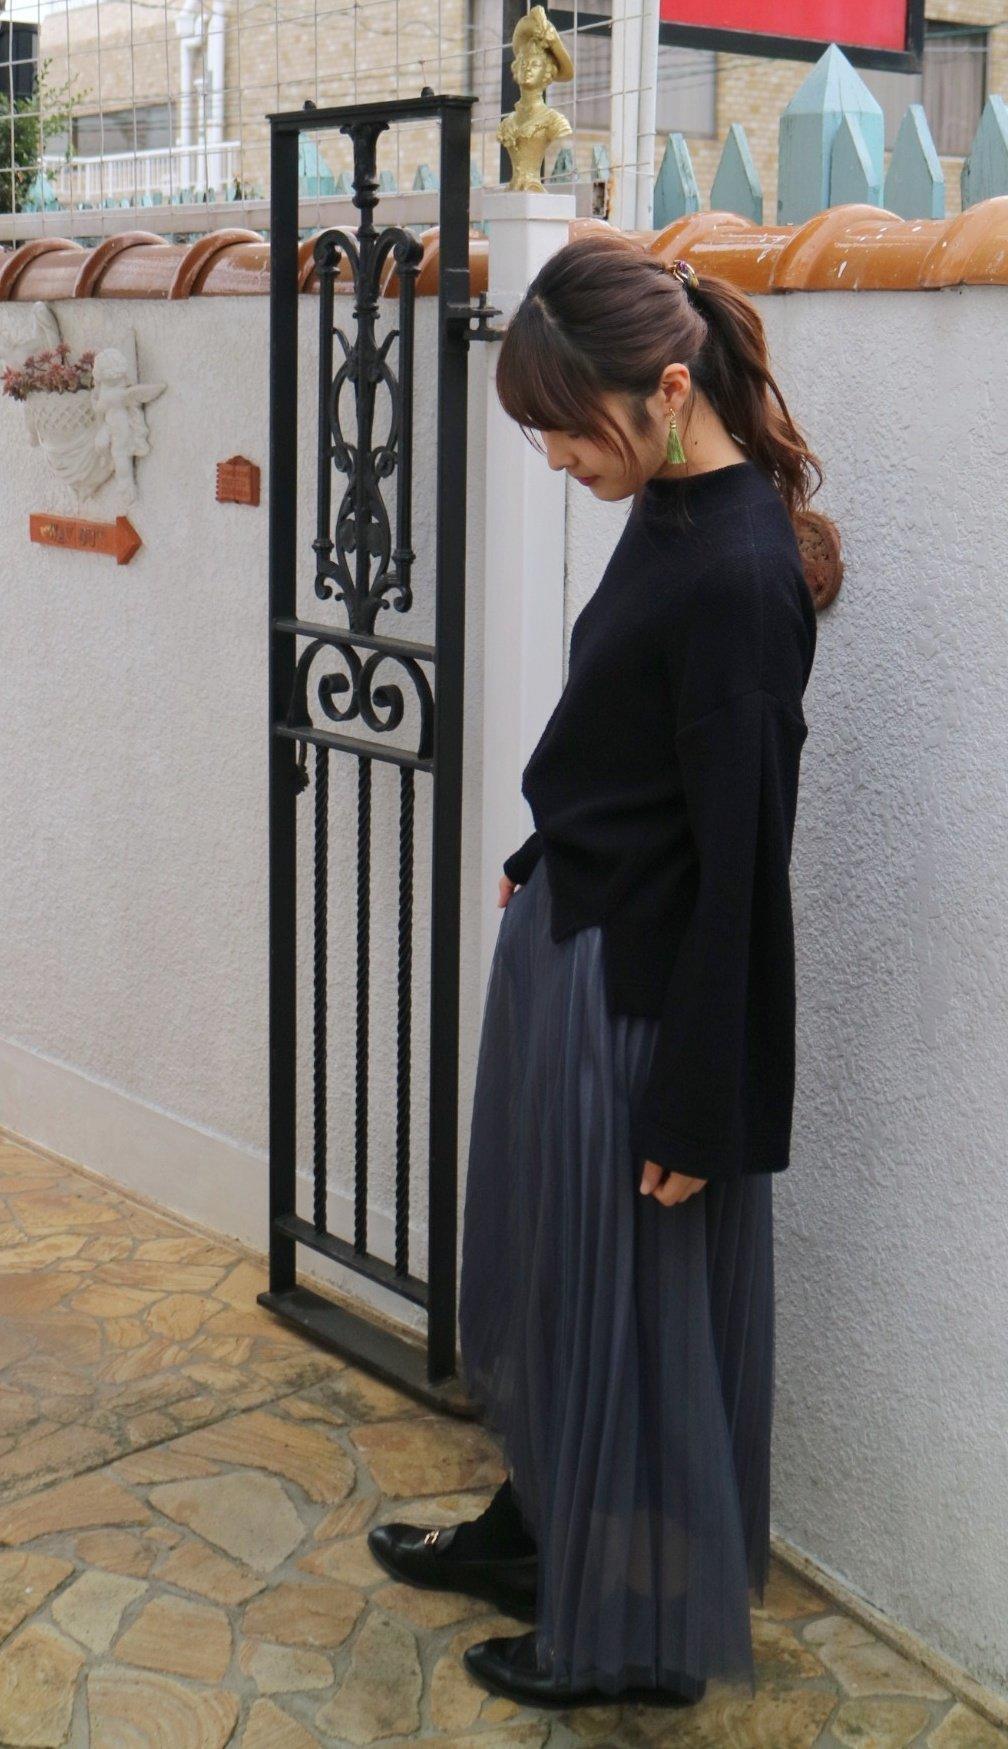 https://emifull.jp/emifulls_blog/11th/uploads/lsJ6zxkD.jpg